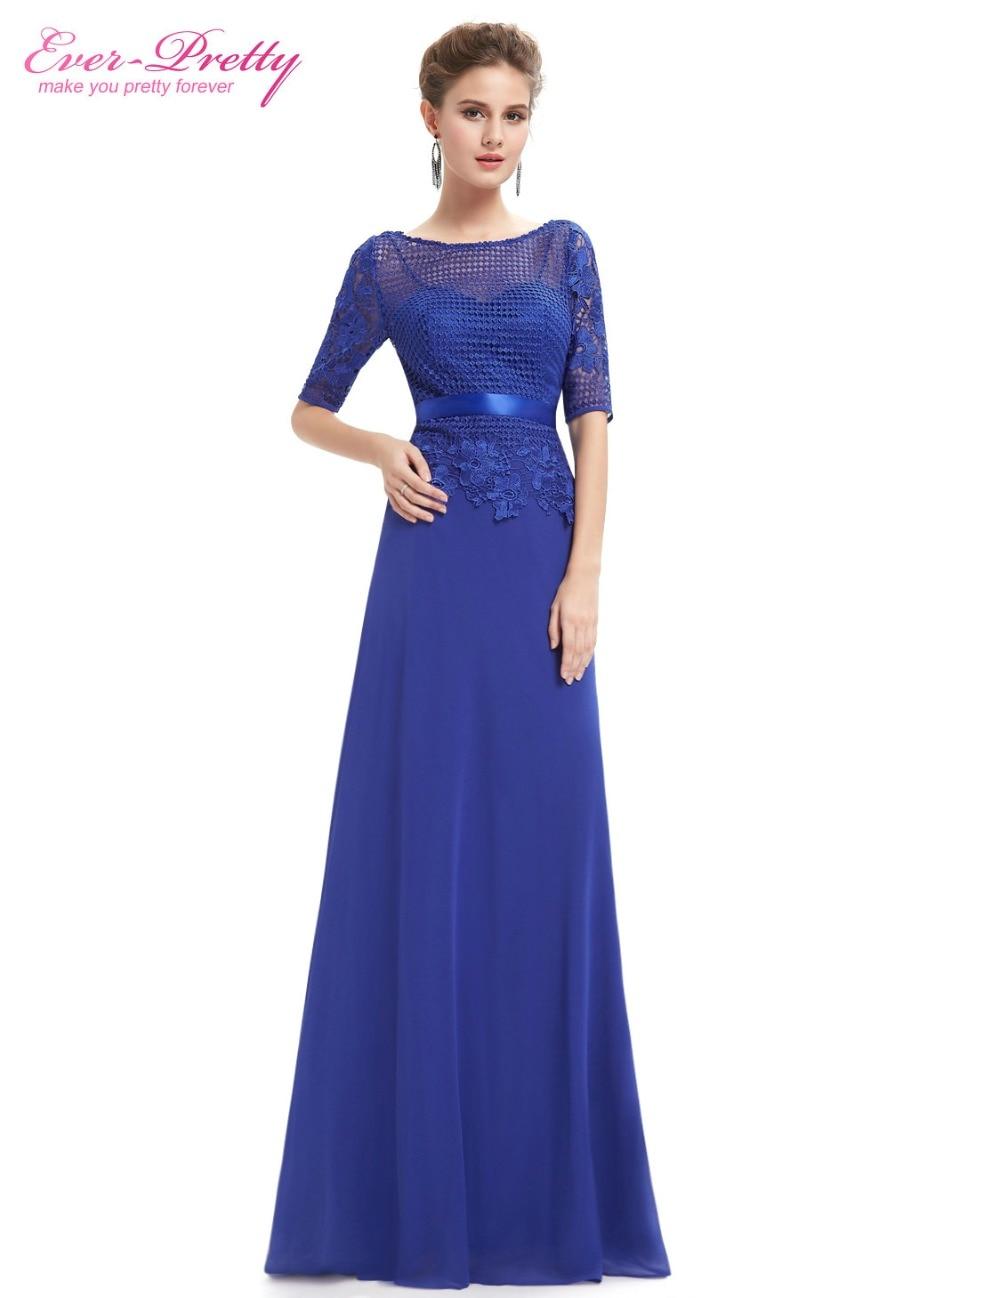 [Clearance Sale] Evening Dresses Ever Pretty HE08706SB Women Elegant Royal Blue O-Neck Weddings Events Long Evening Dresses 2017